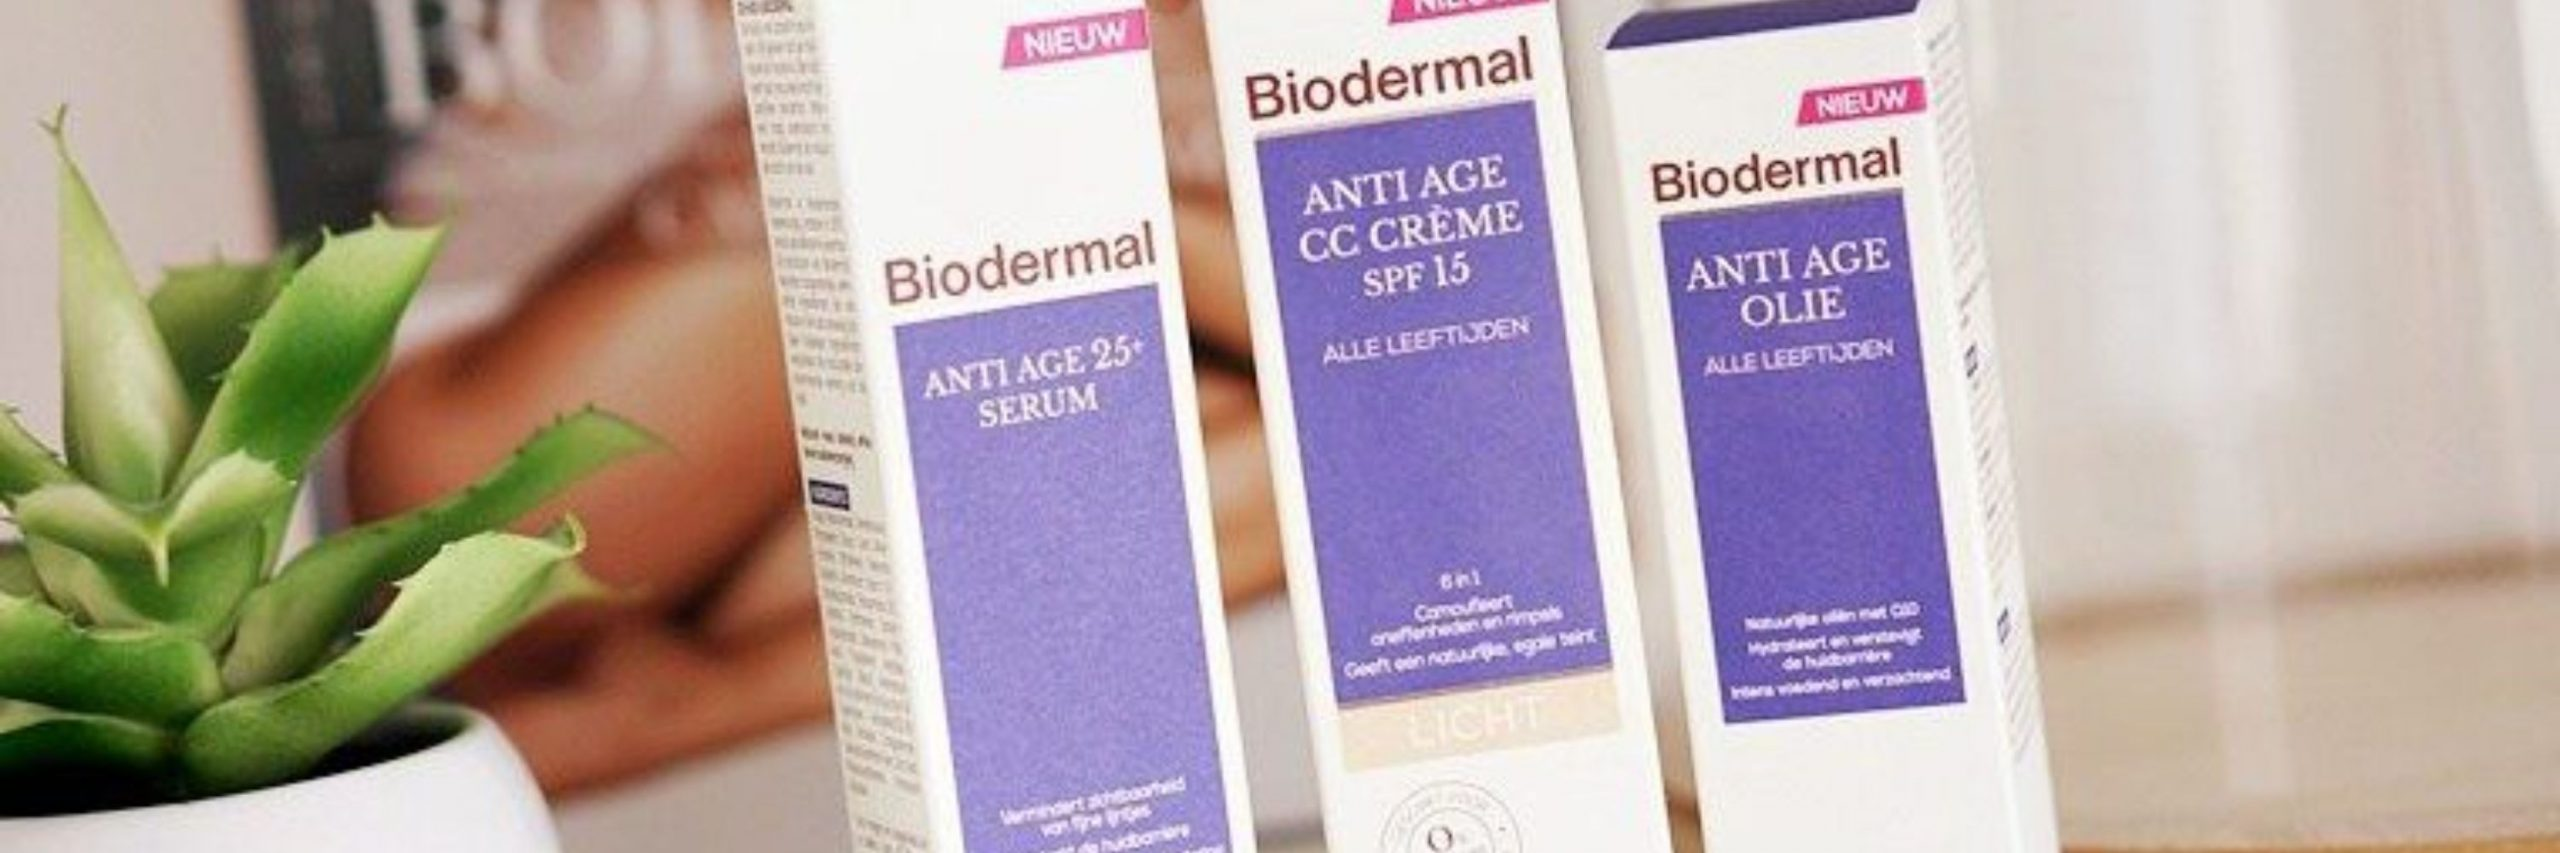 Test & Tell: Vernieuwde Biodermal Anti Age producten